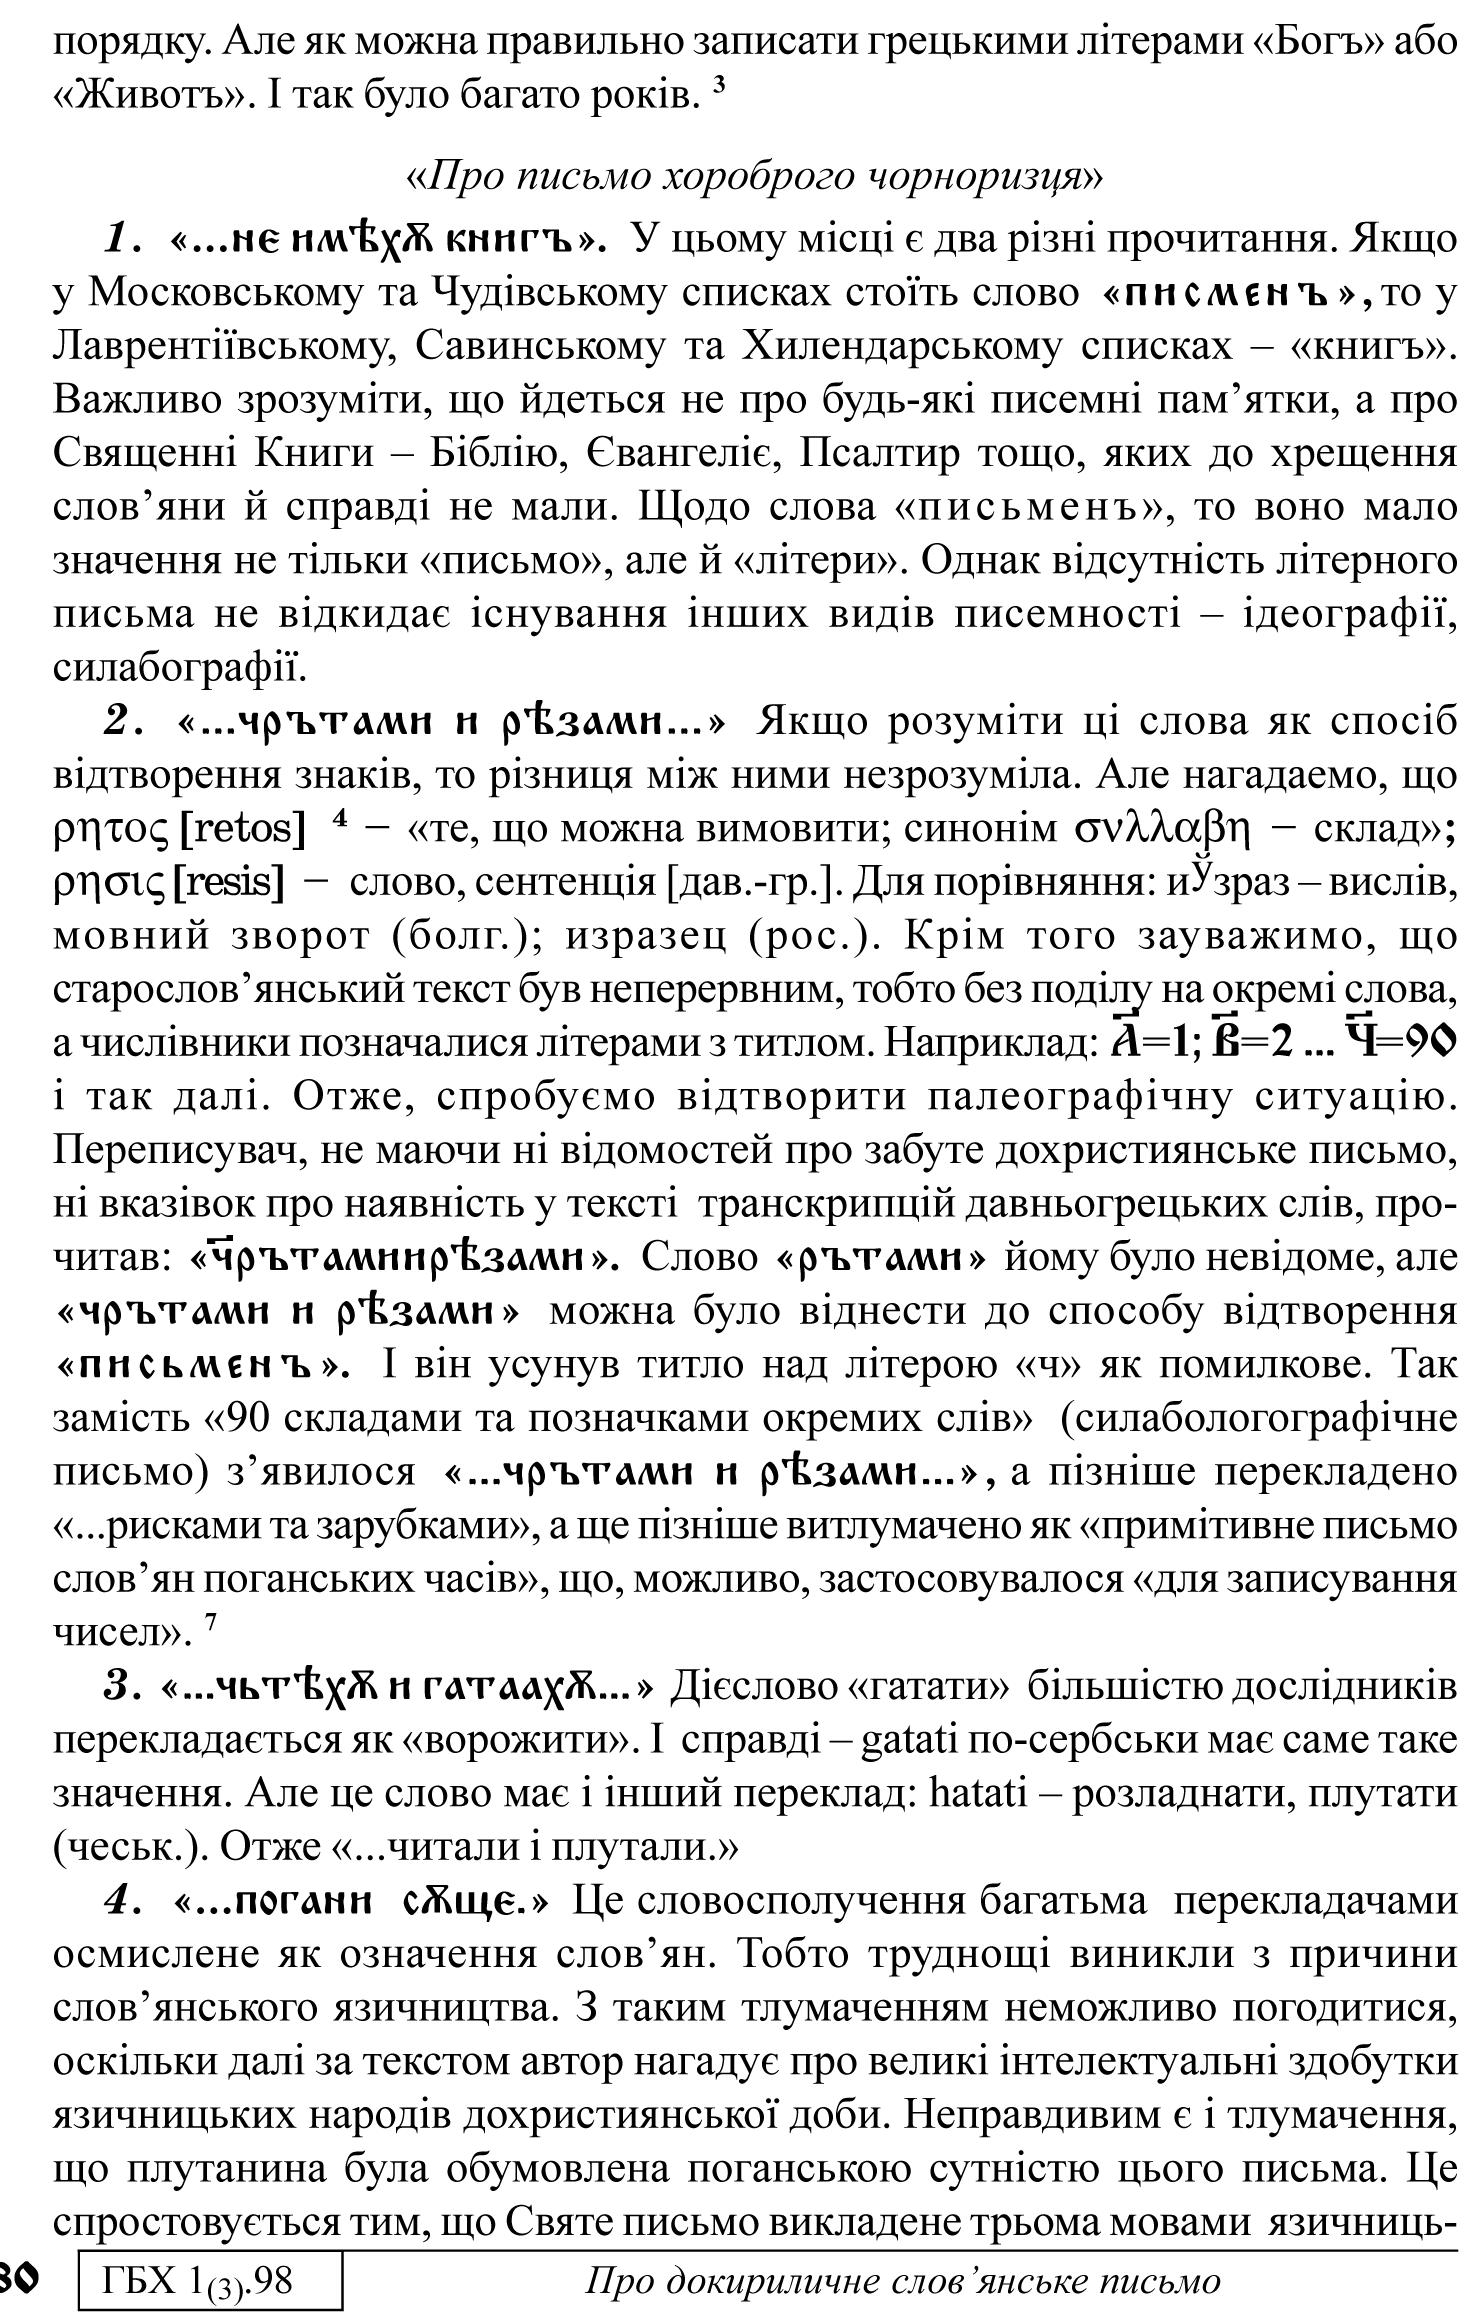 Докирил письмо-2.png